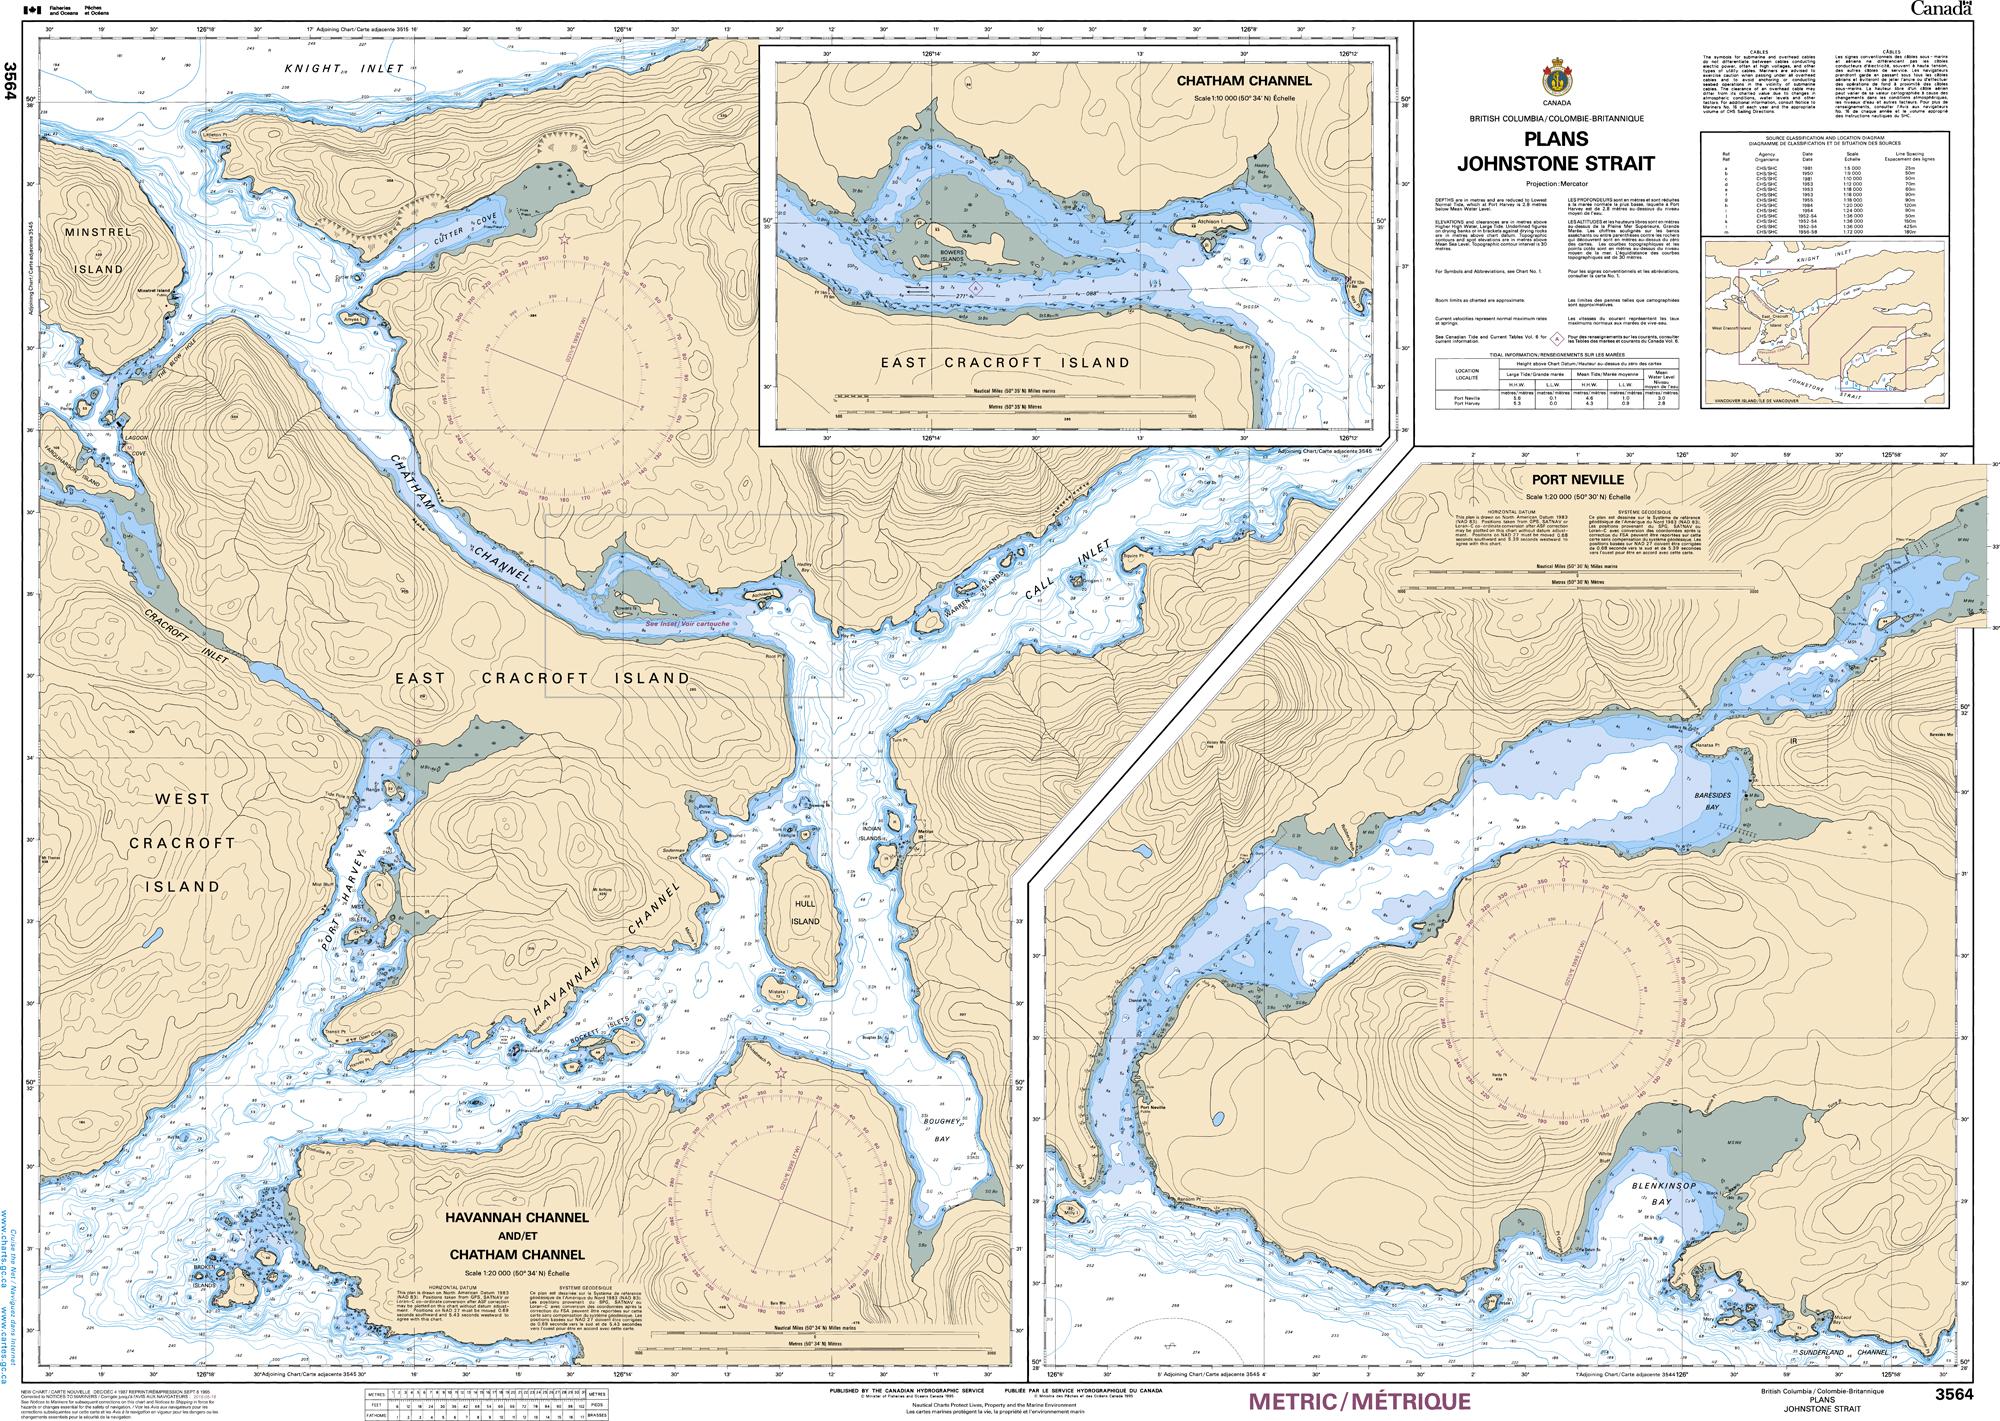 Pacific Region, CHS Chart 3564: Plans - Johnstone Strait